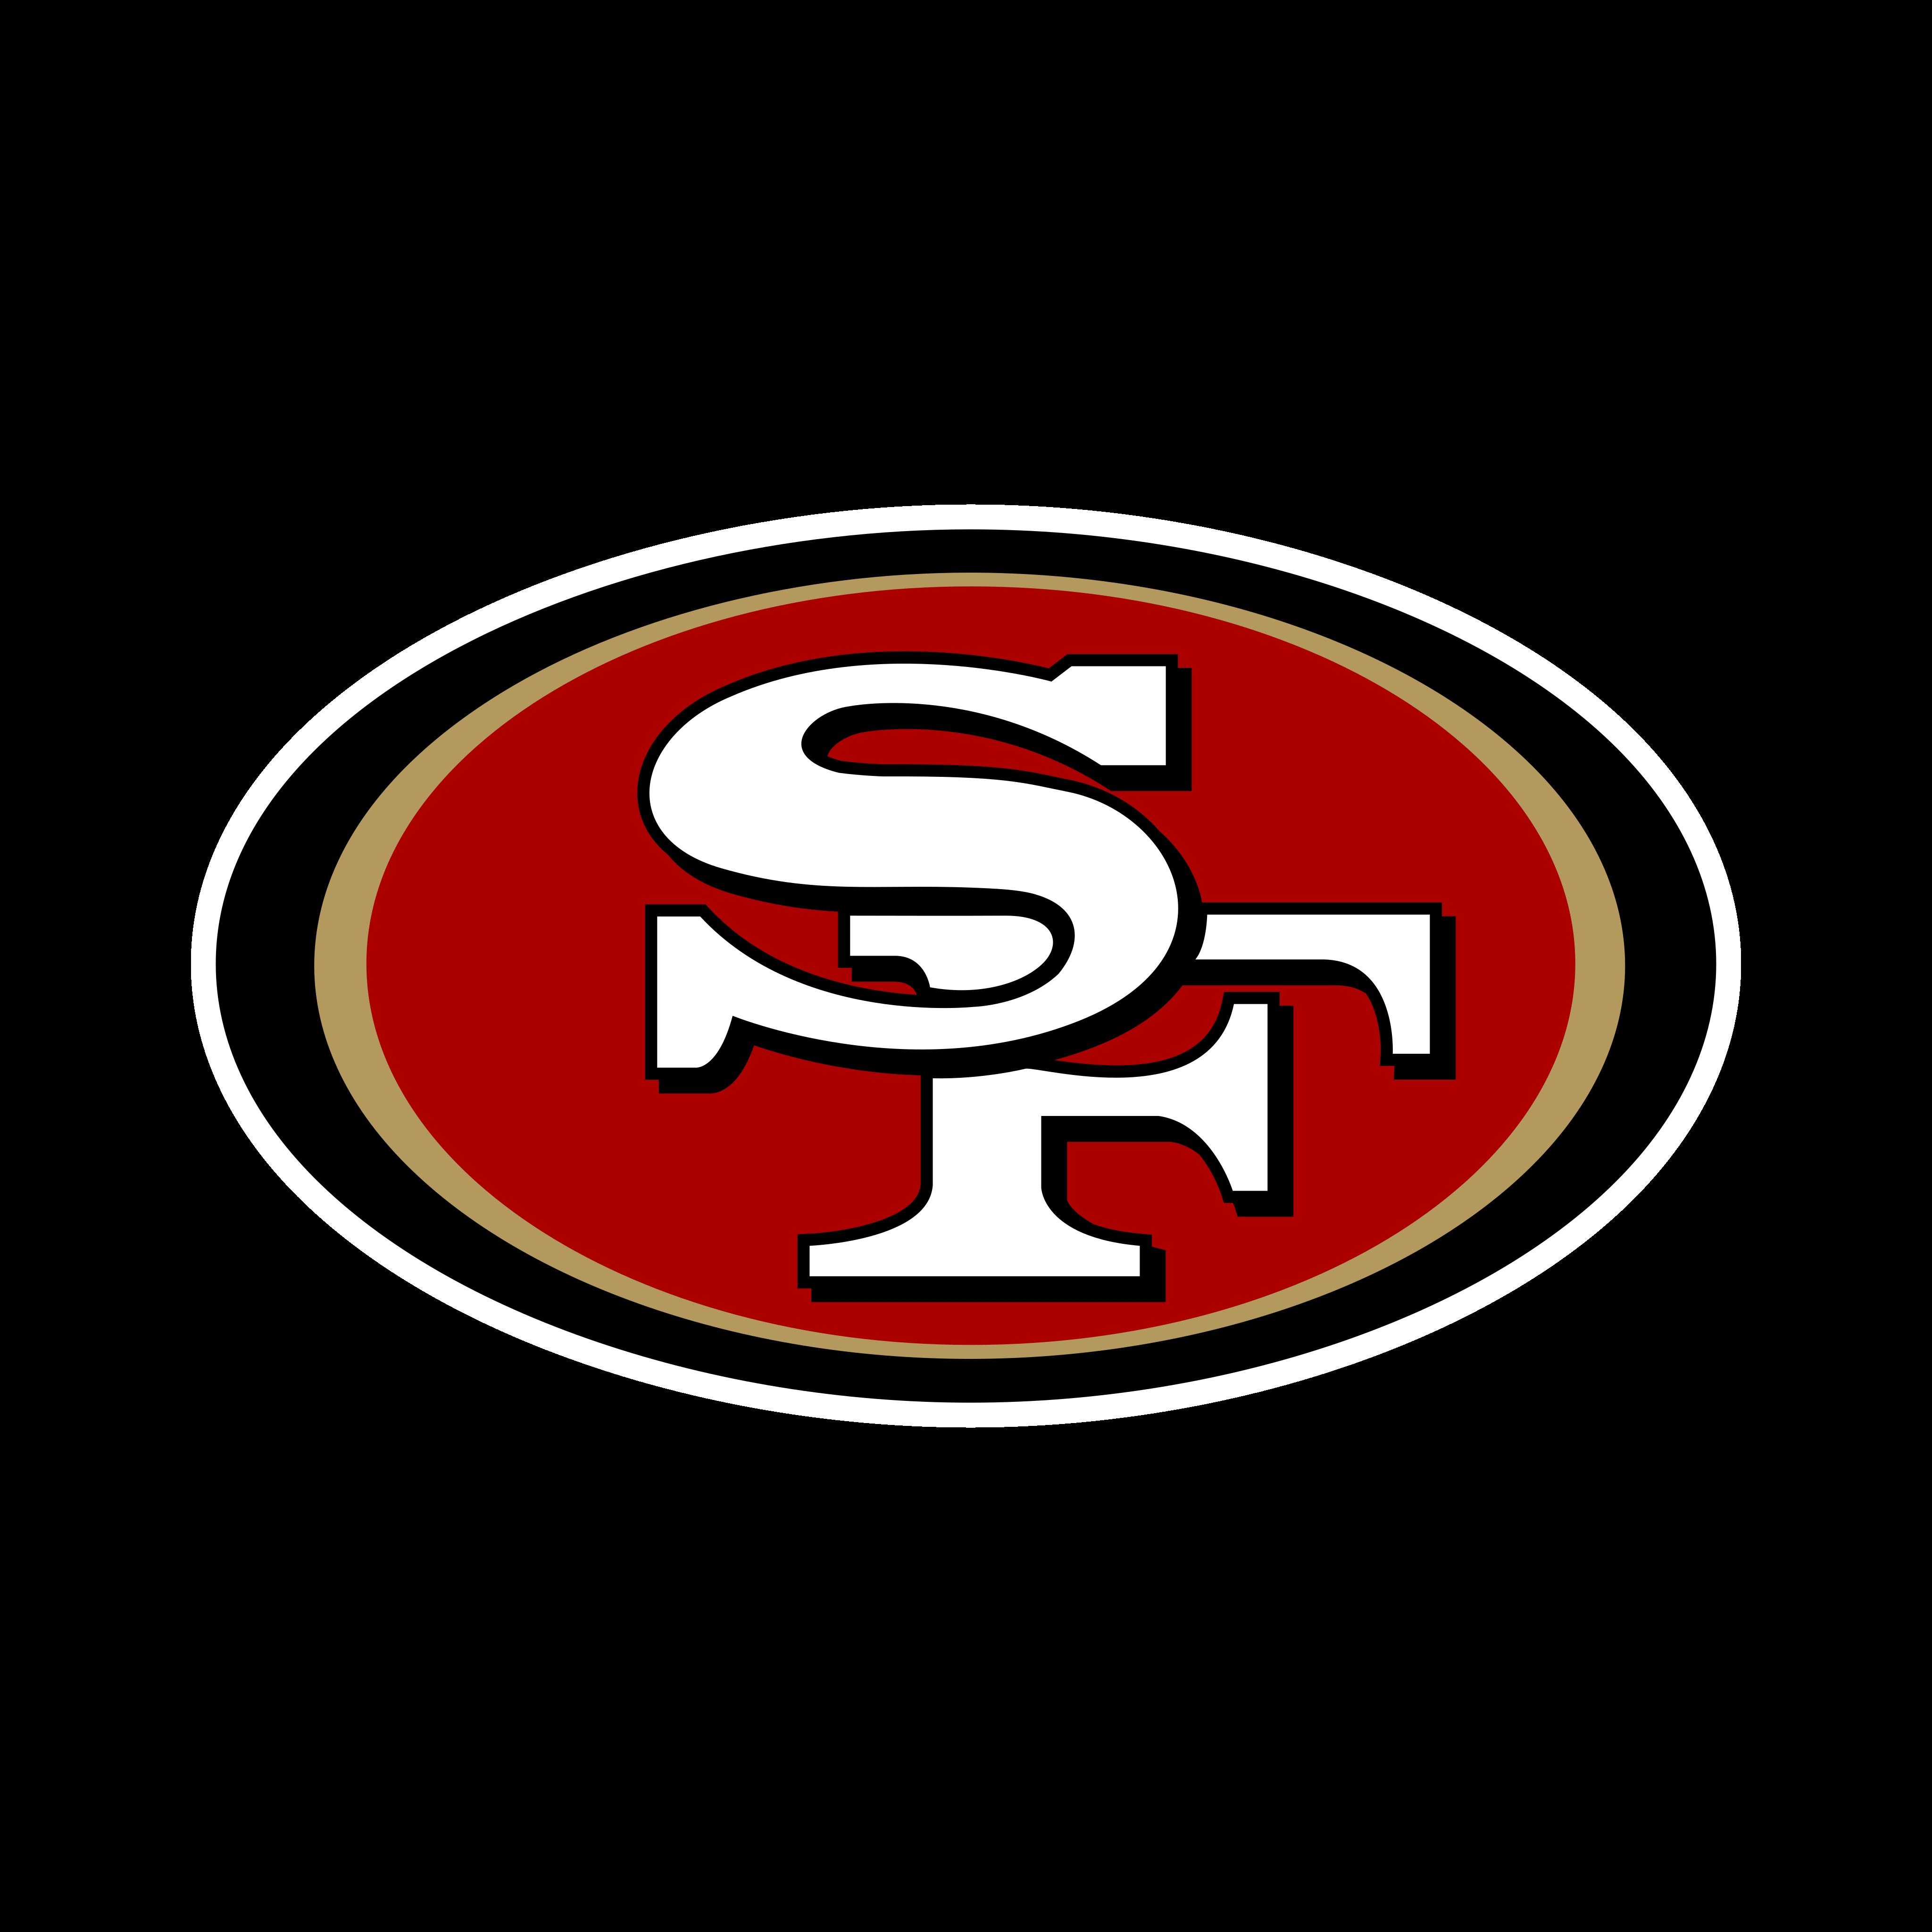 san francisco 49ers logo 0 - San Francisco 49ers Logo